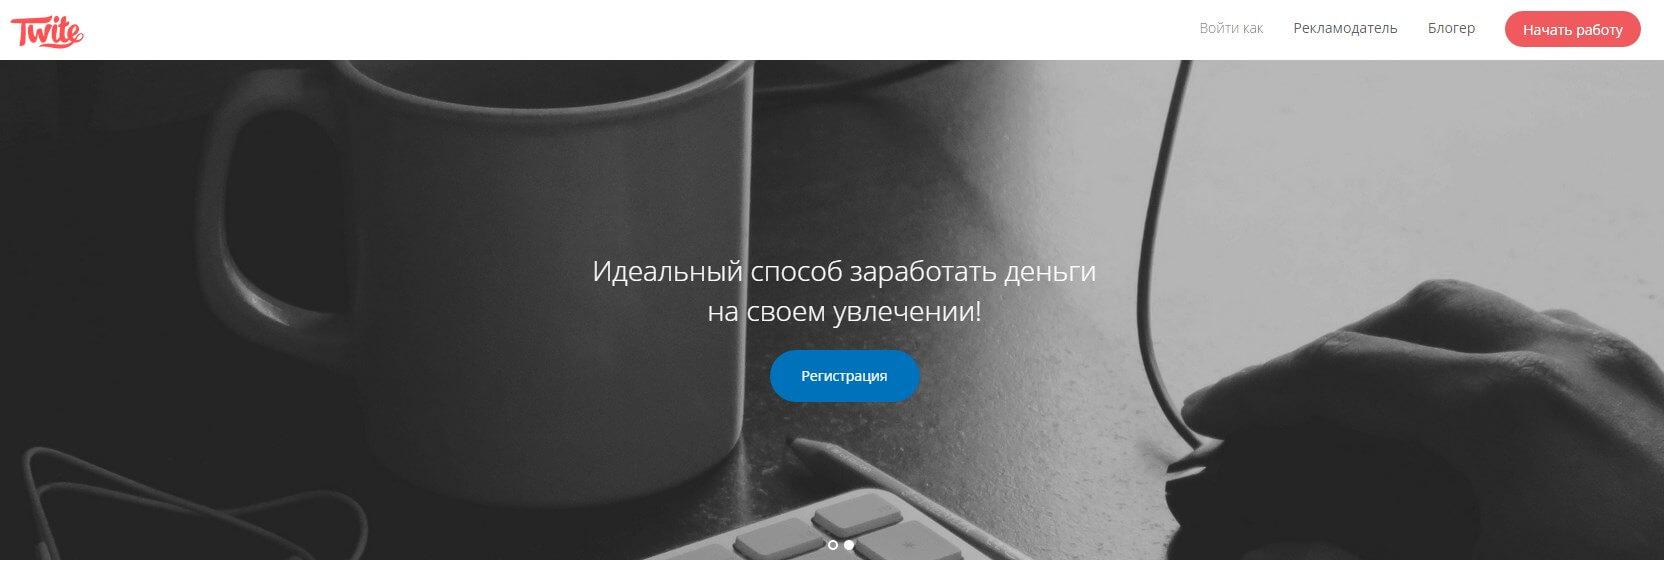 Twite реклама в фейсбук